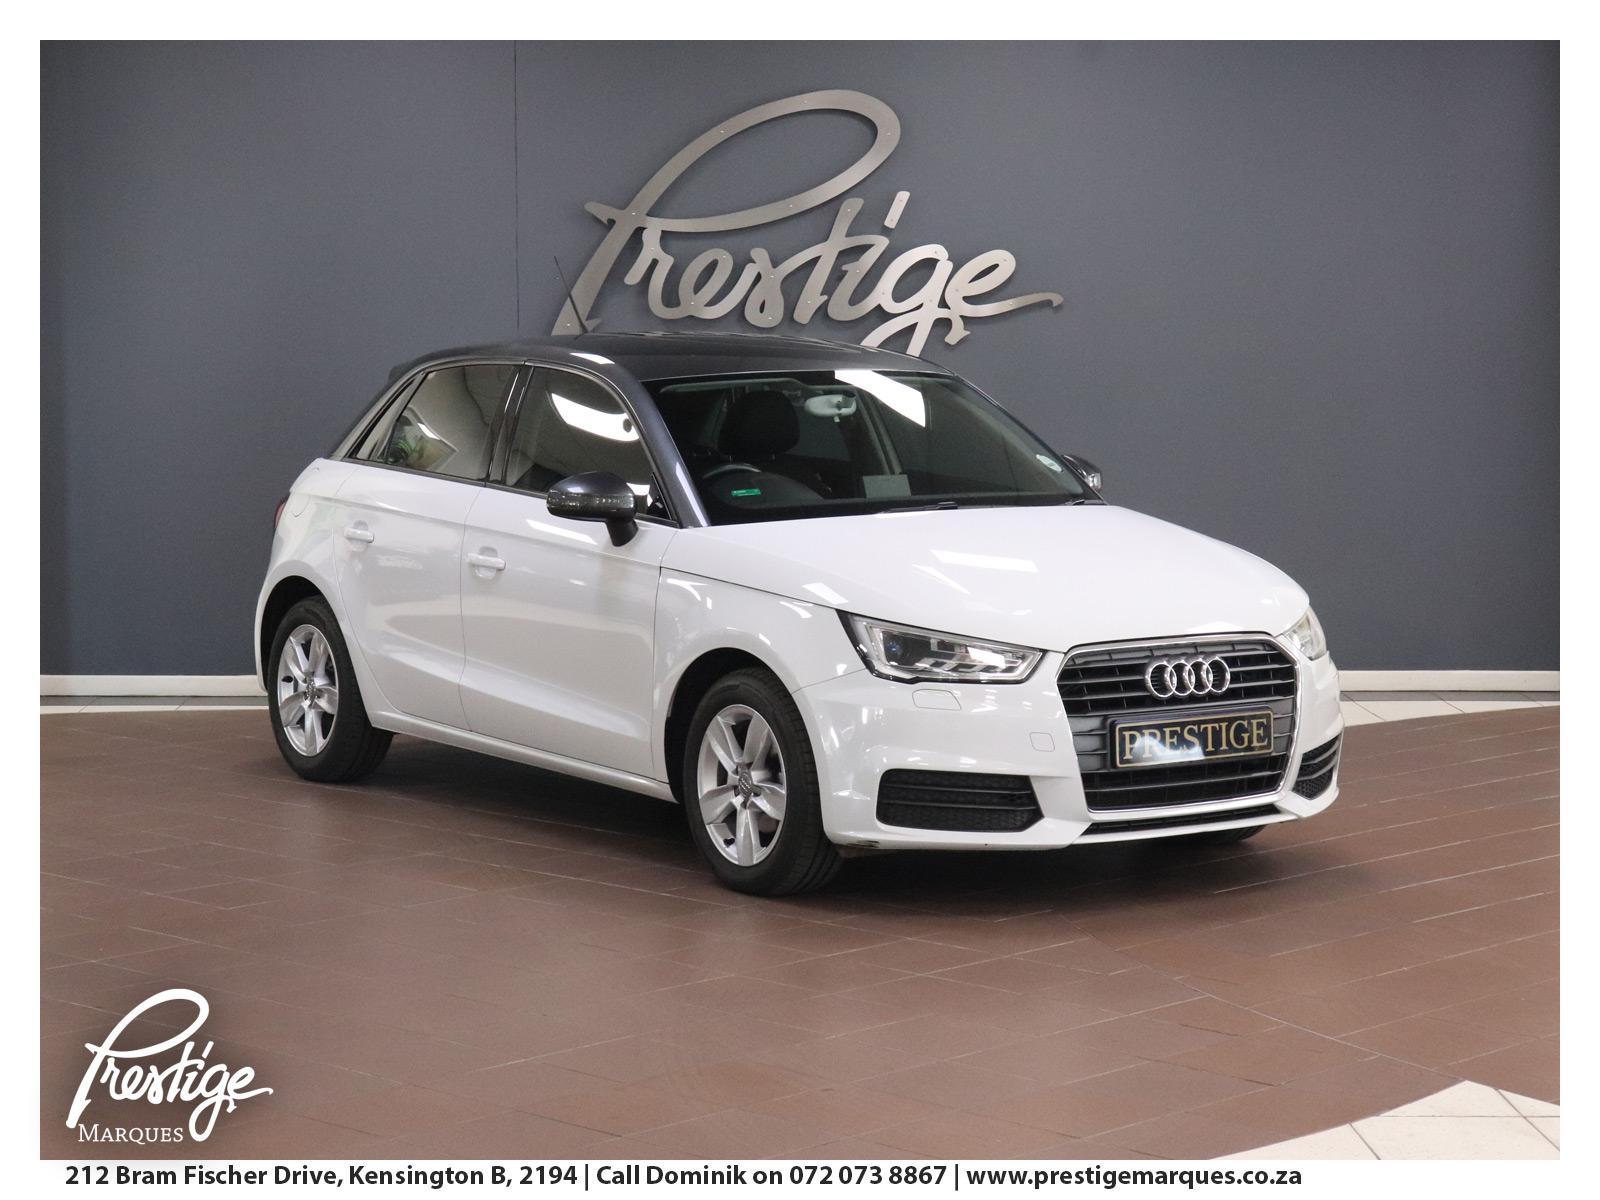 2015-Audi-A1-Prestige-Marques-Randburg-Sandton-1